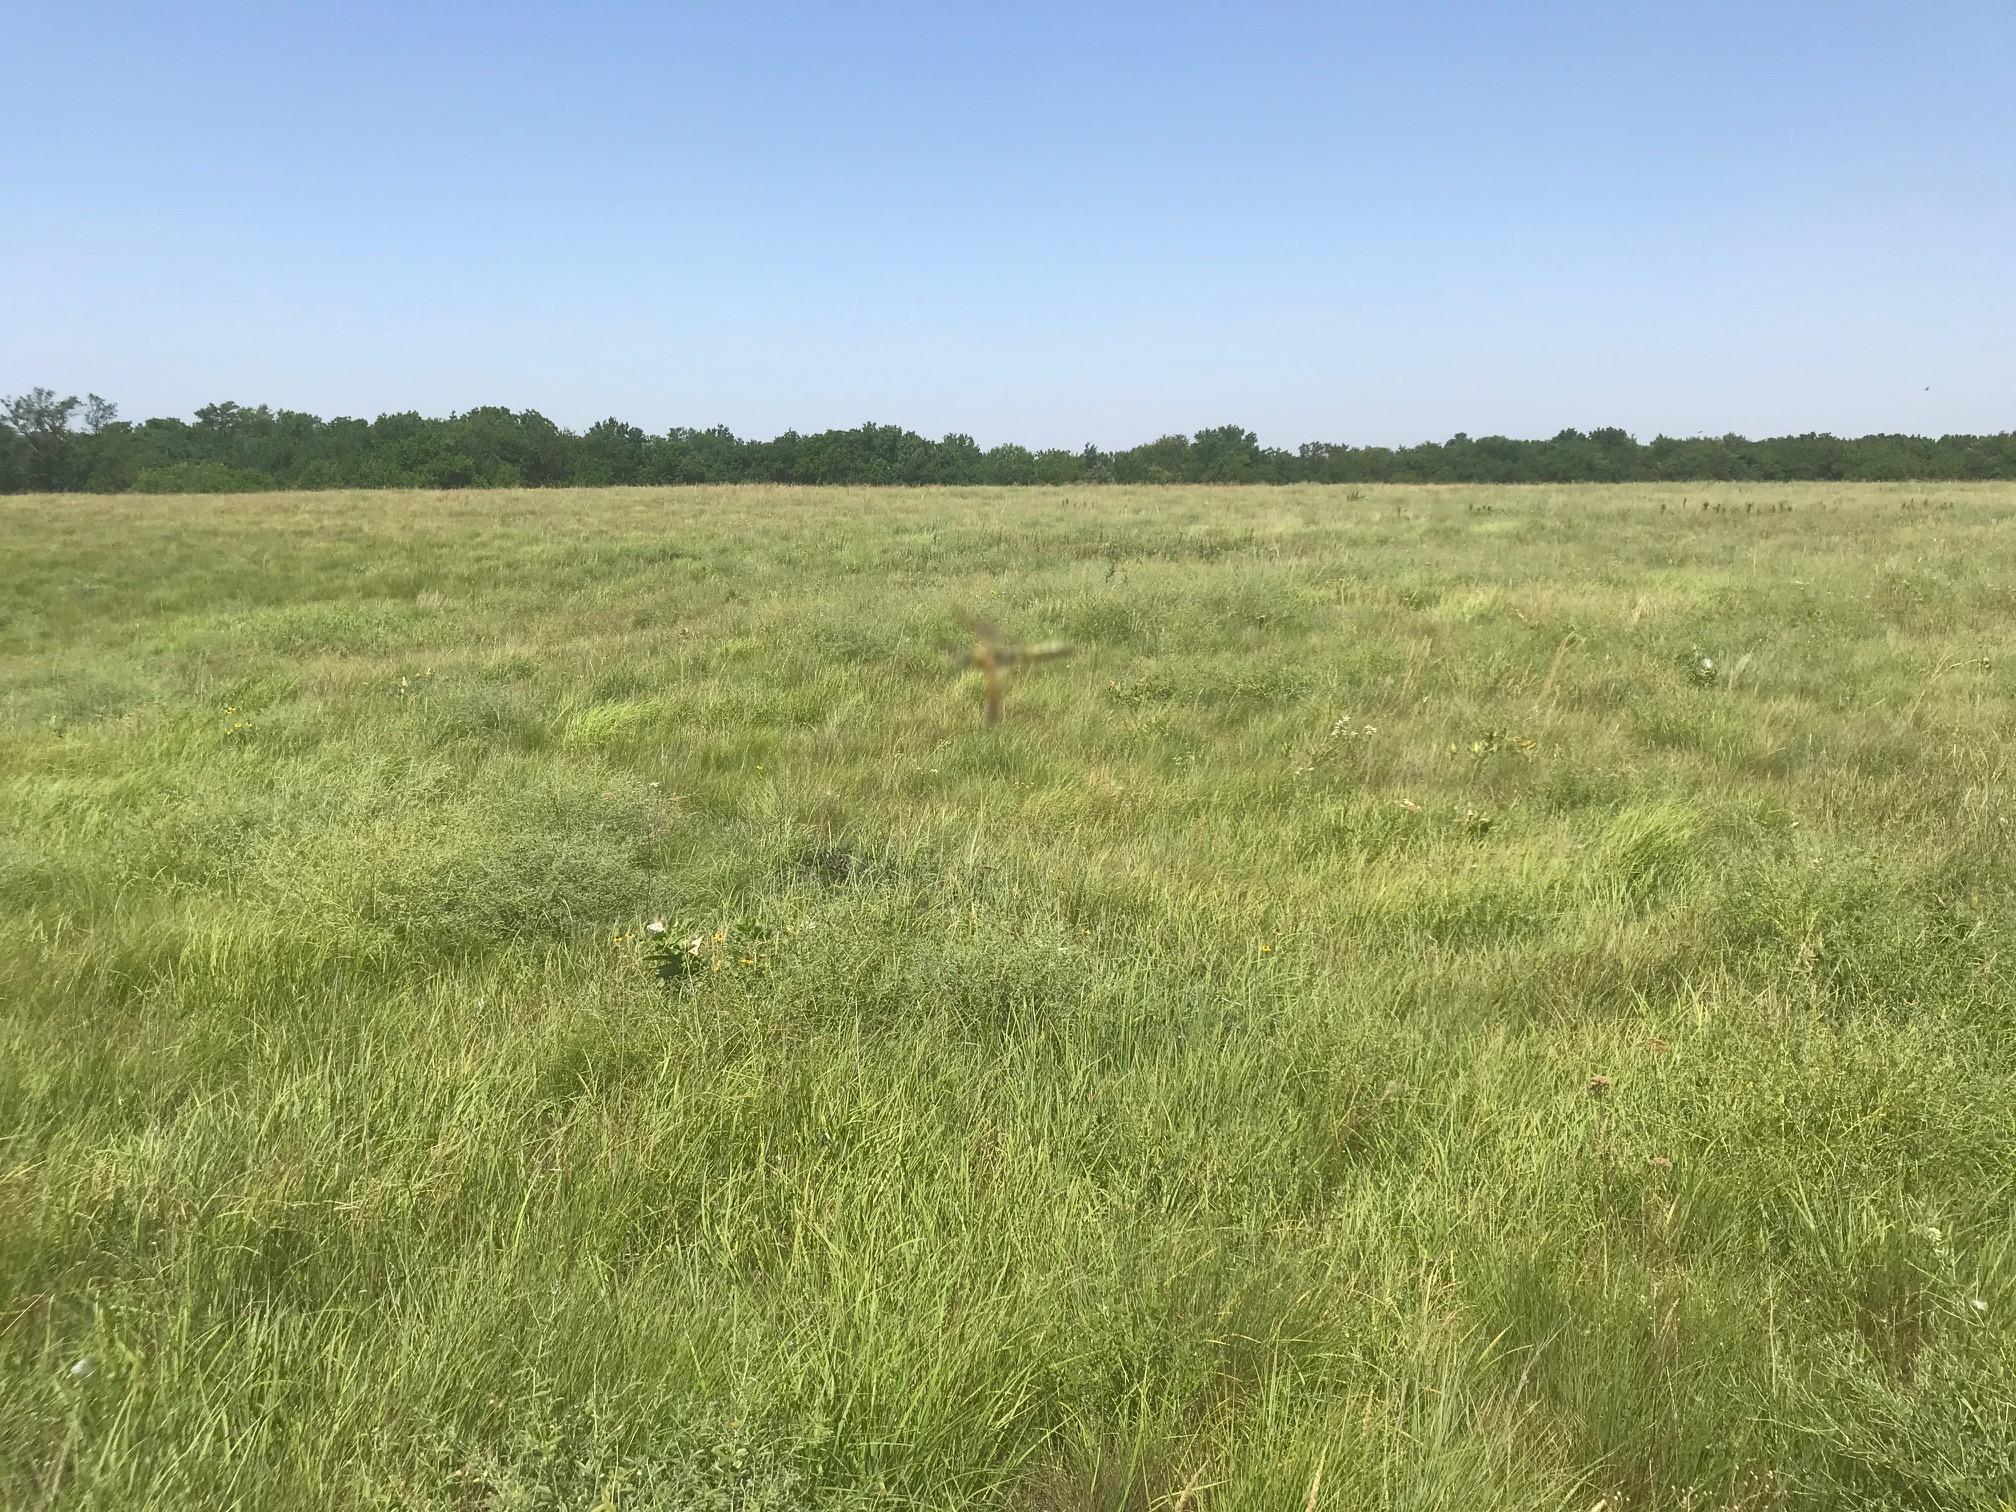 Hay-meadow-BIR1074.jpg